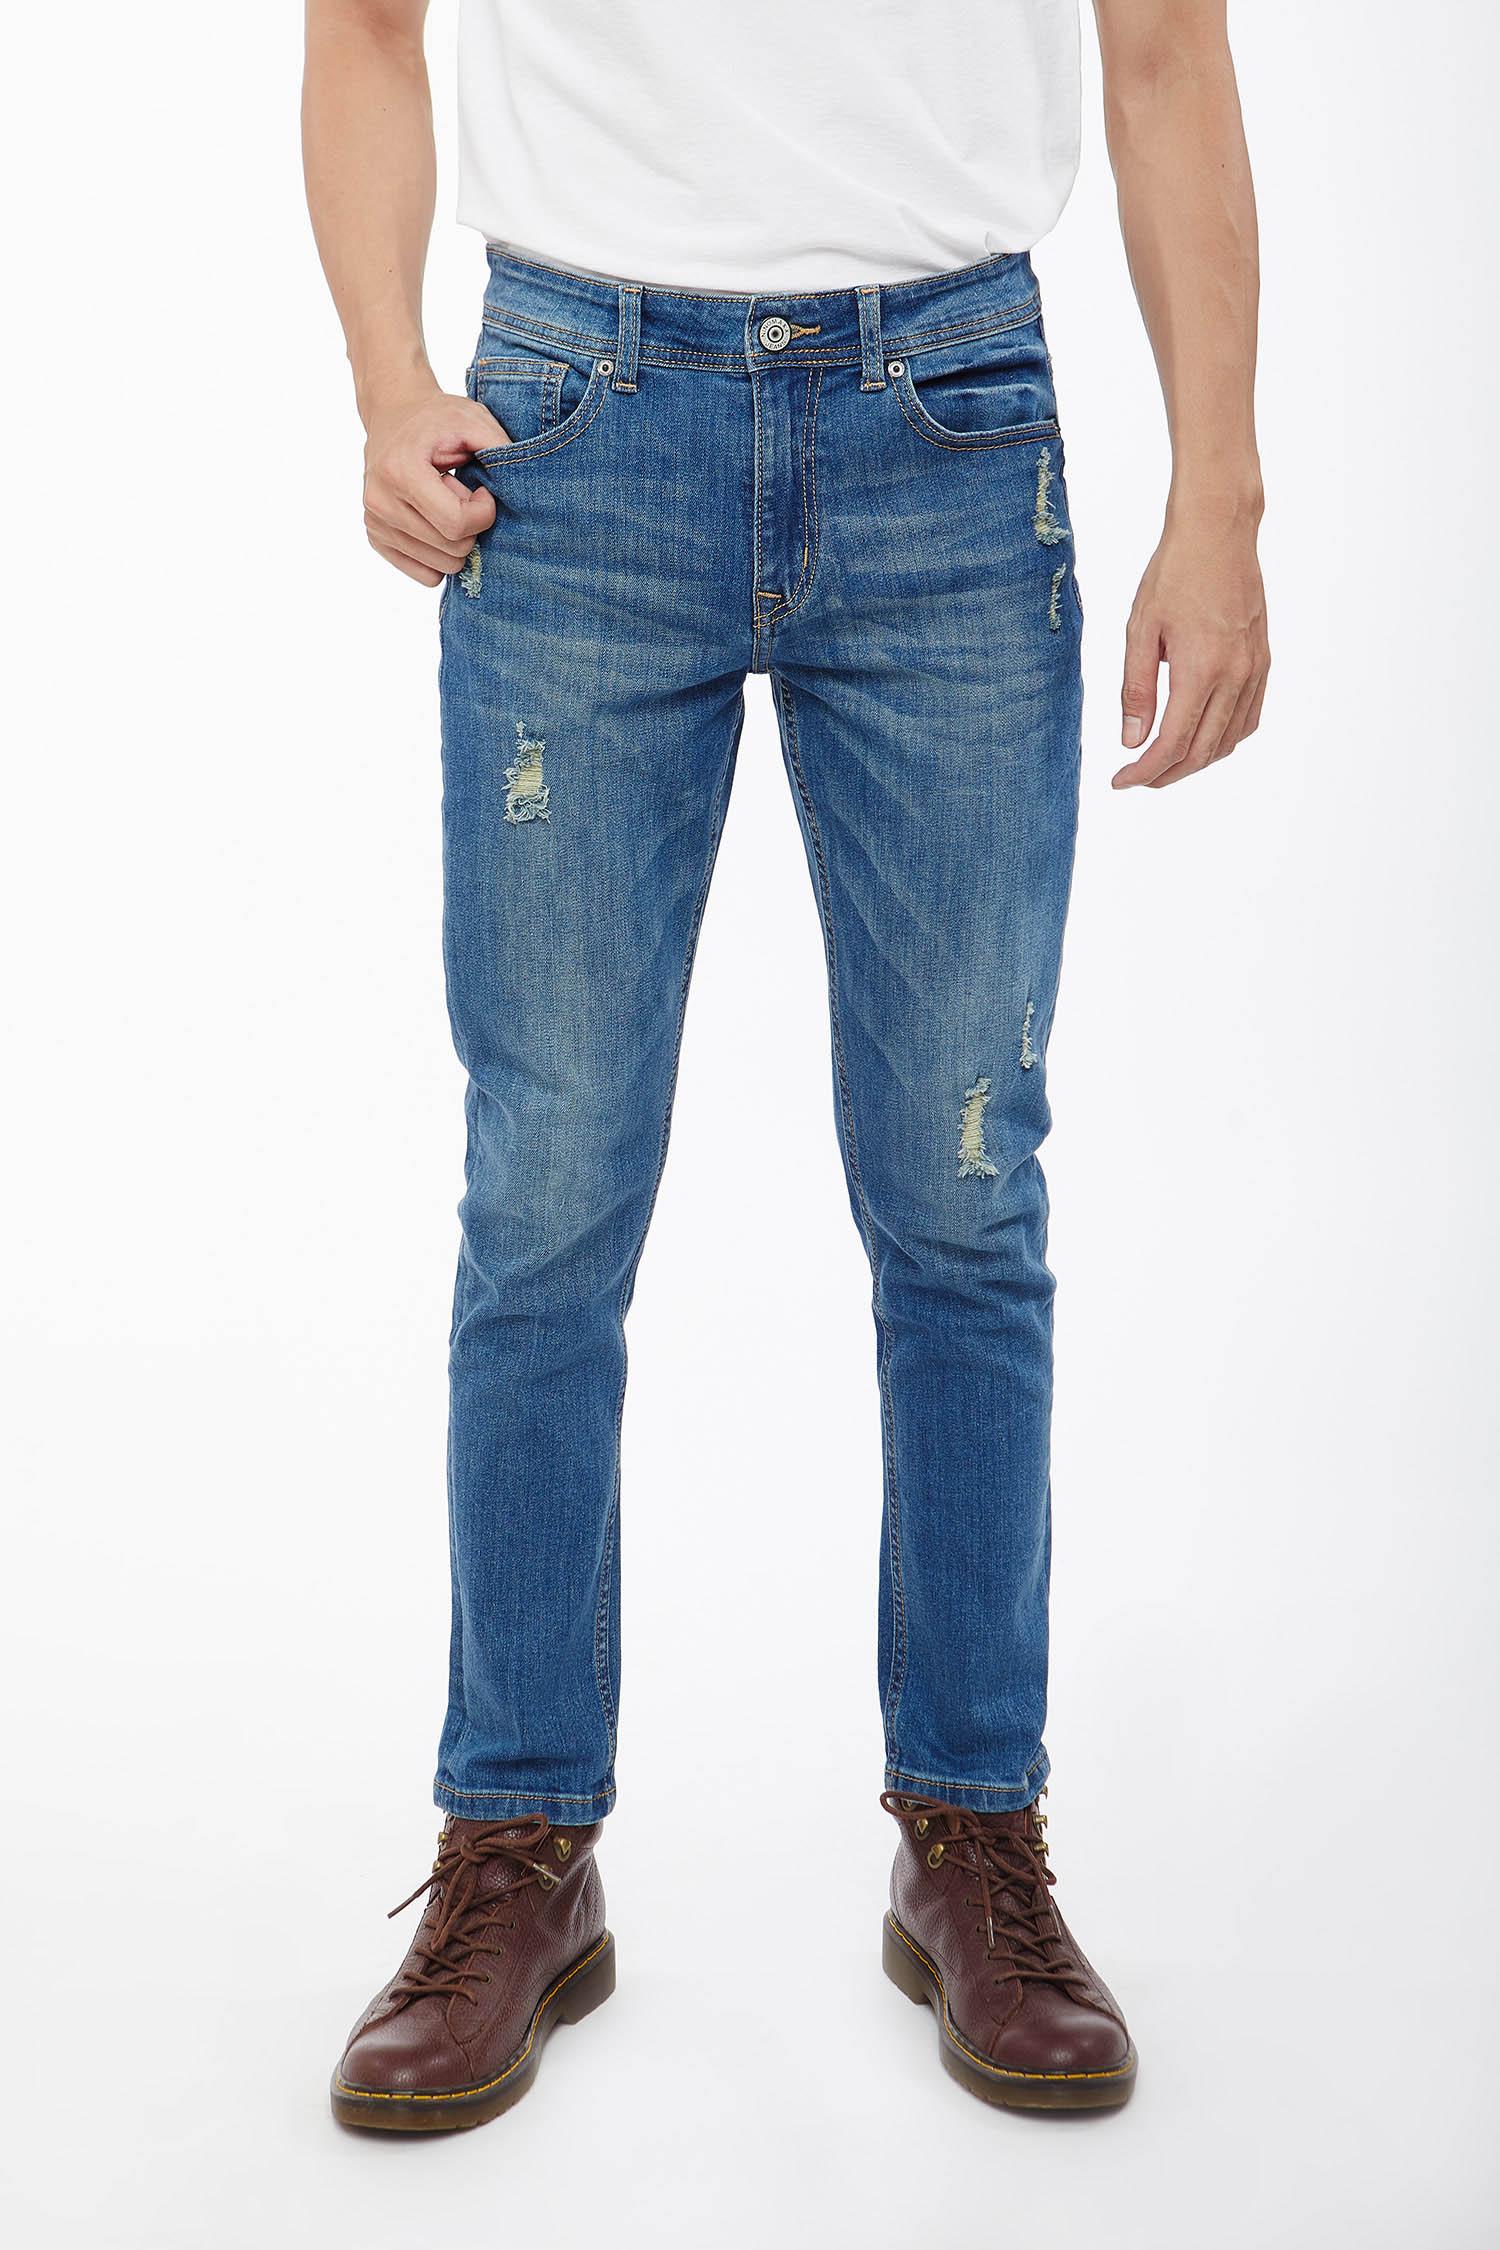 quần jean nam - 1904027